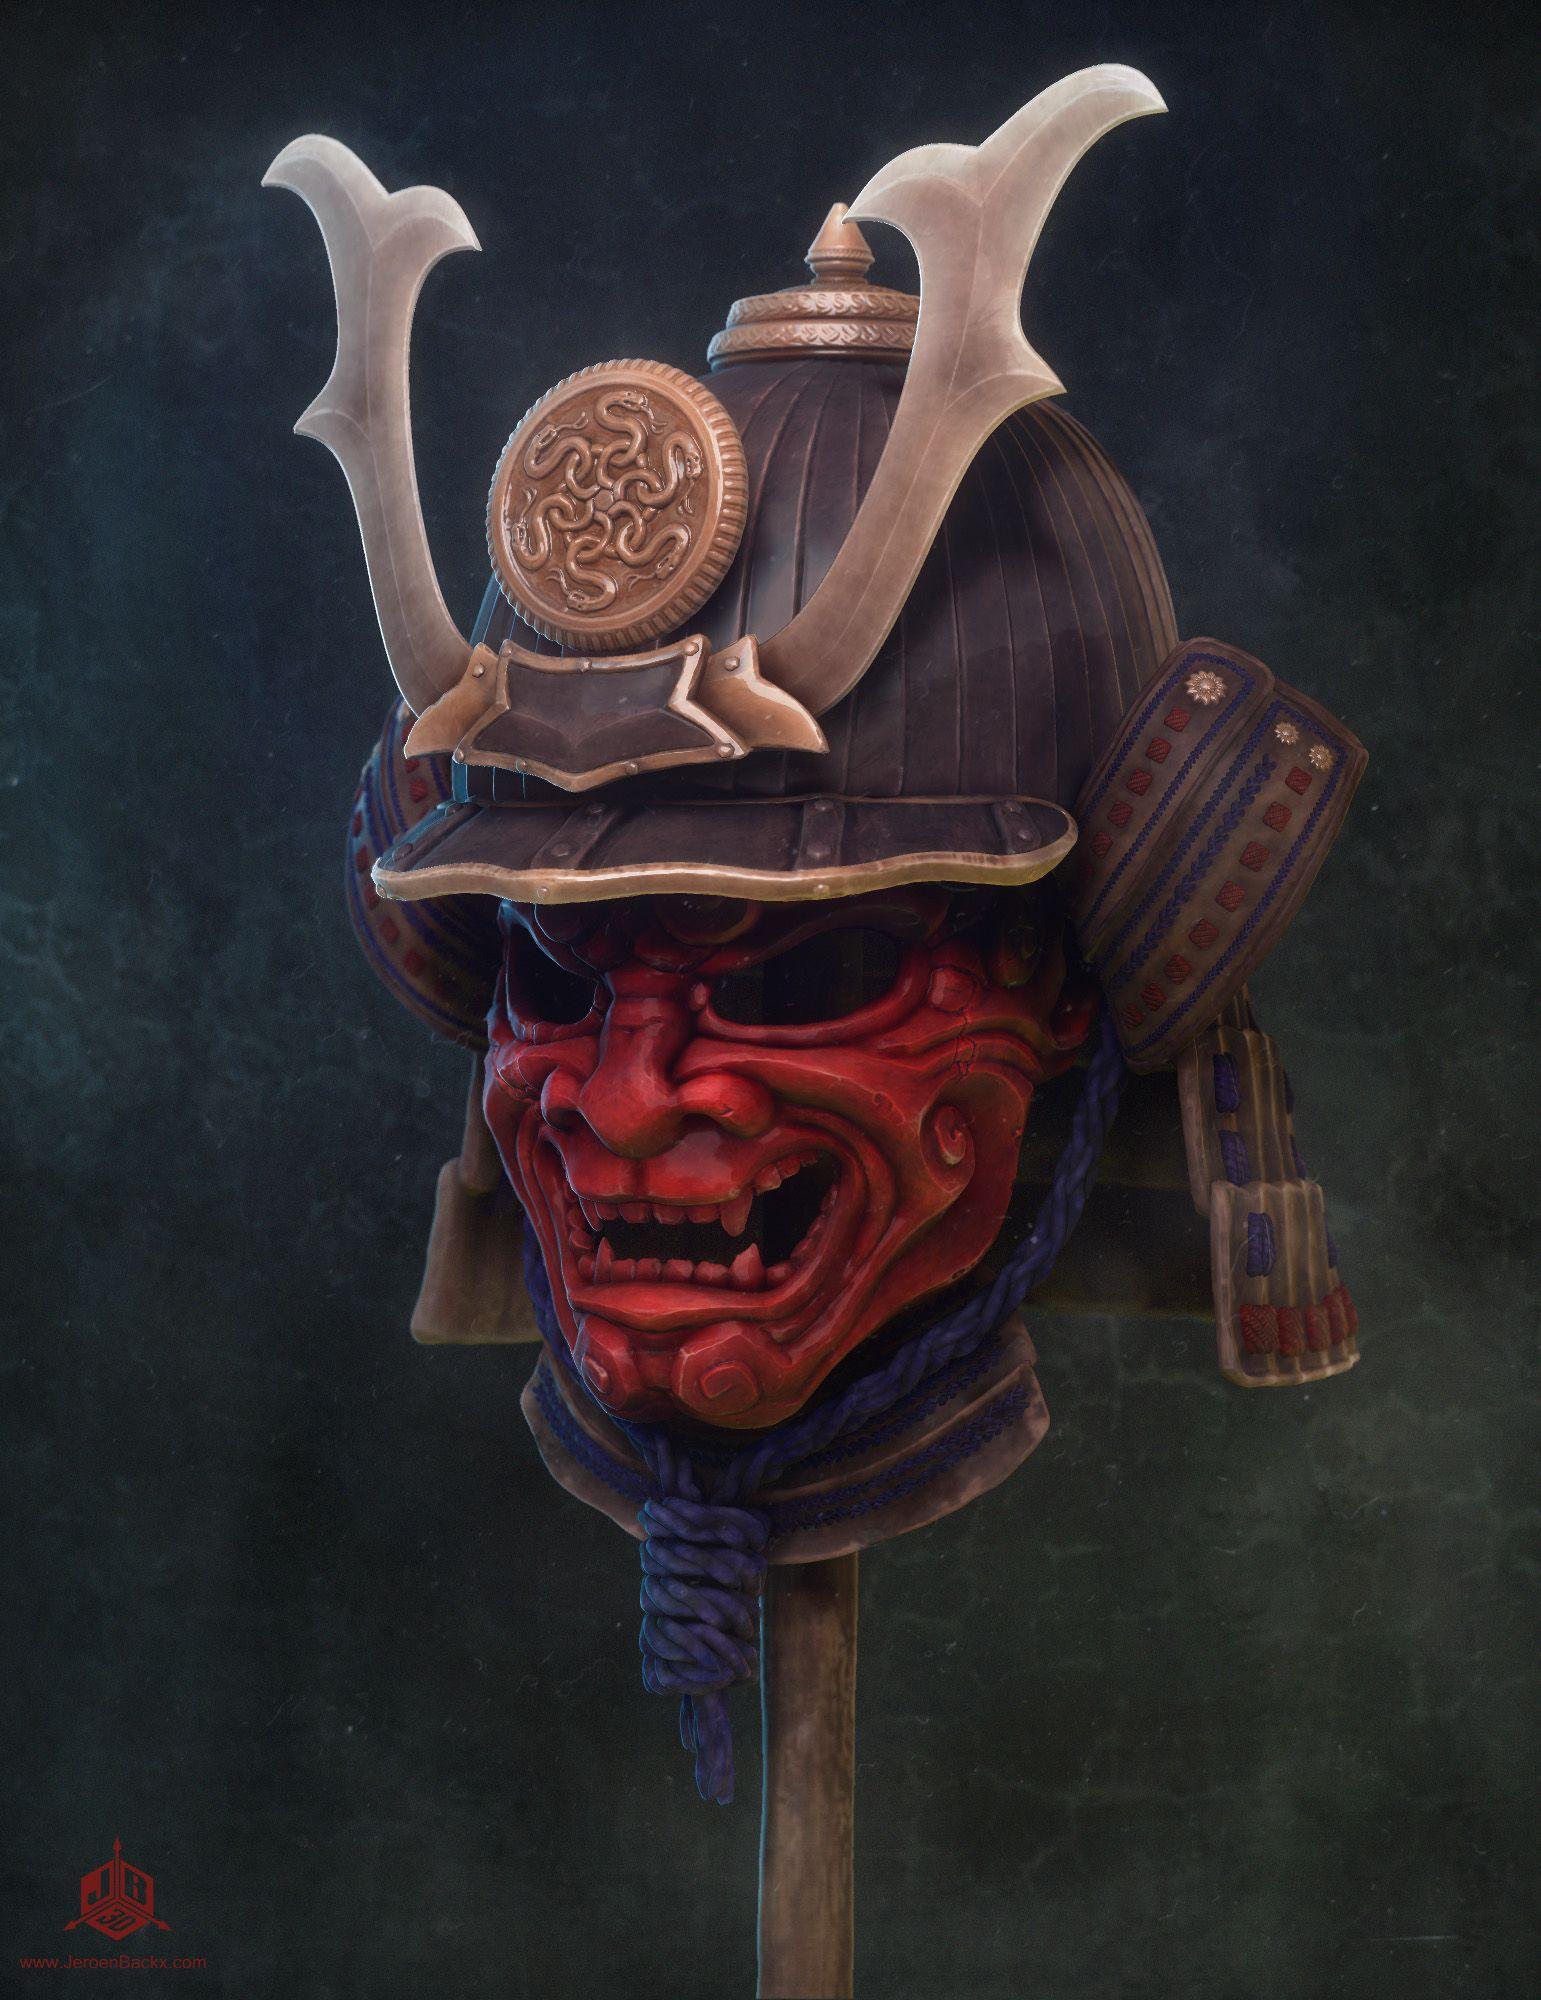 samurai mask.jpg (JPEG Image, 1541 × 2000 pixels) - Scaled (39%)